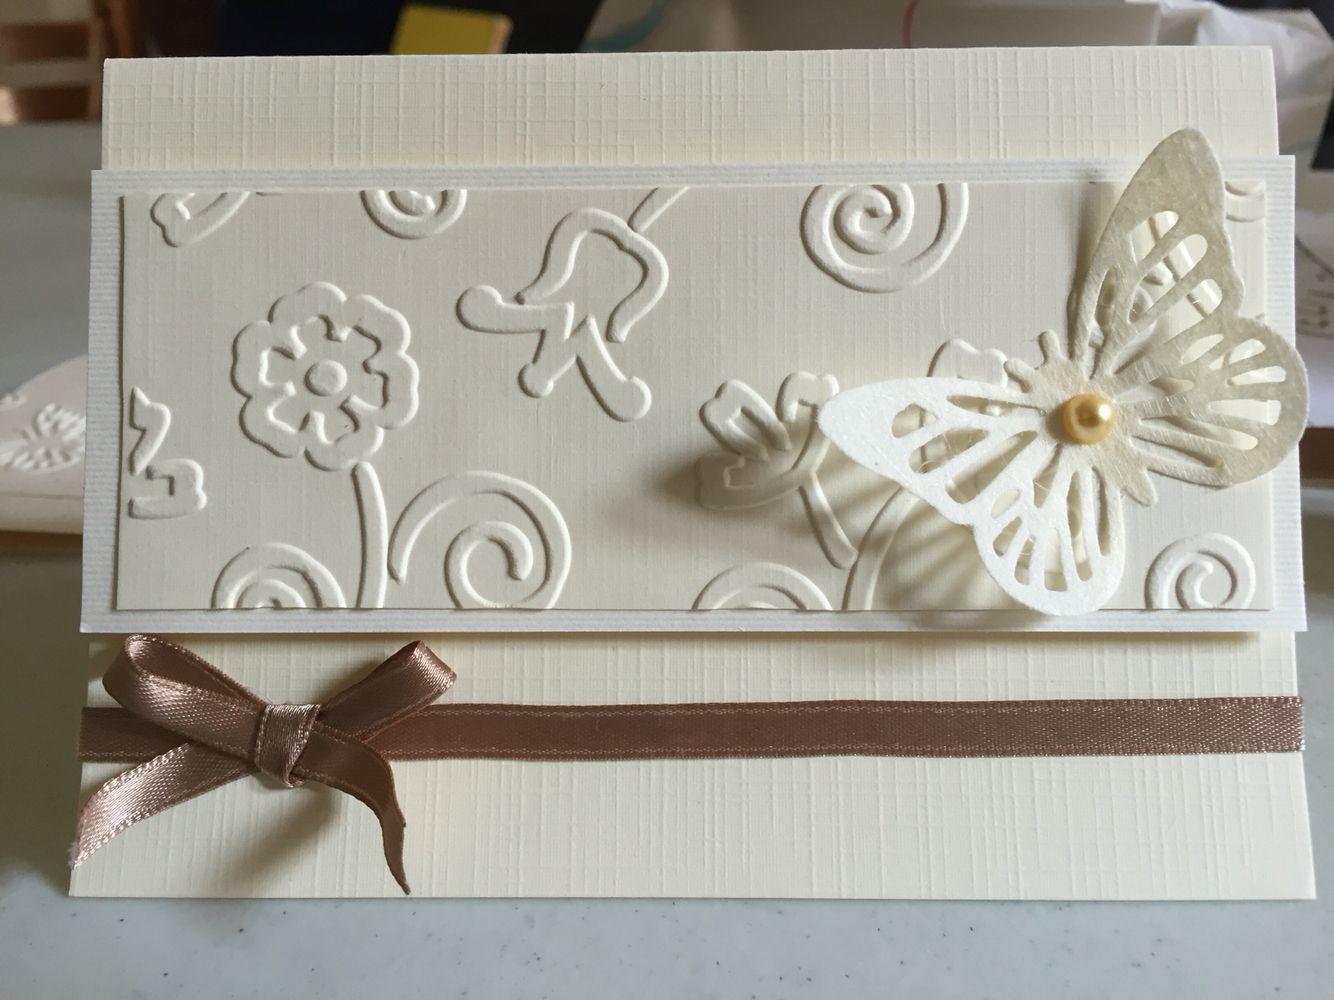 Biglietto Auguri Matrimonio Elegante : Biglietto auguri matrimonio sposi pinterest